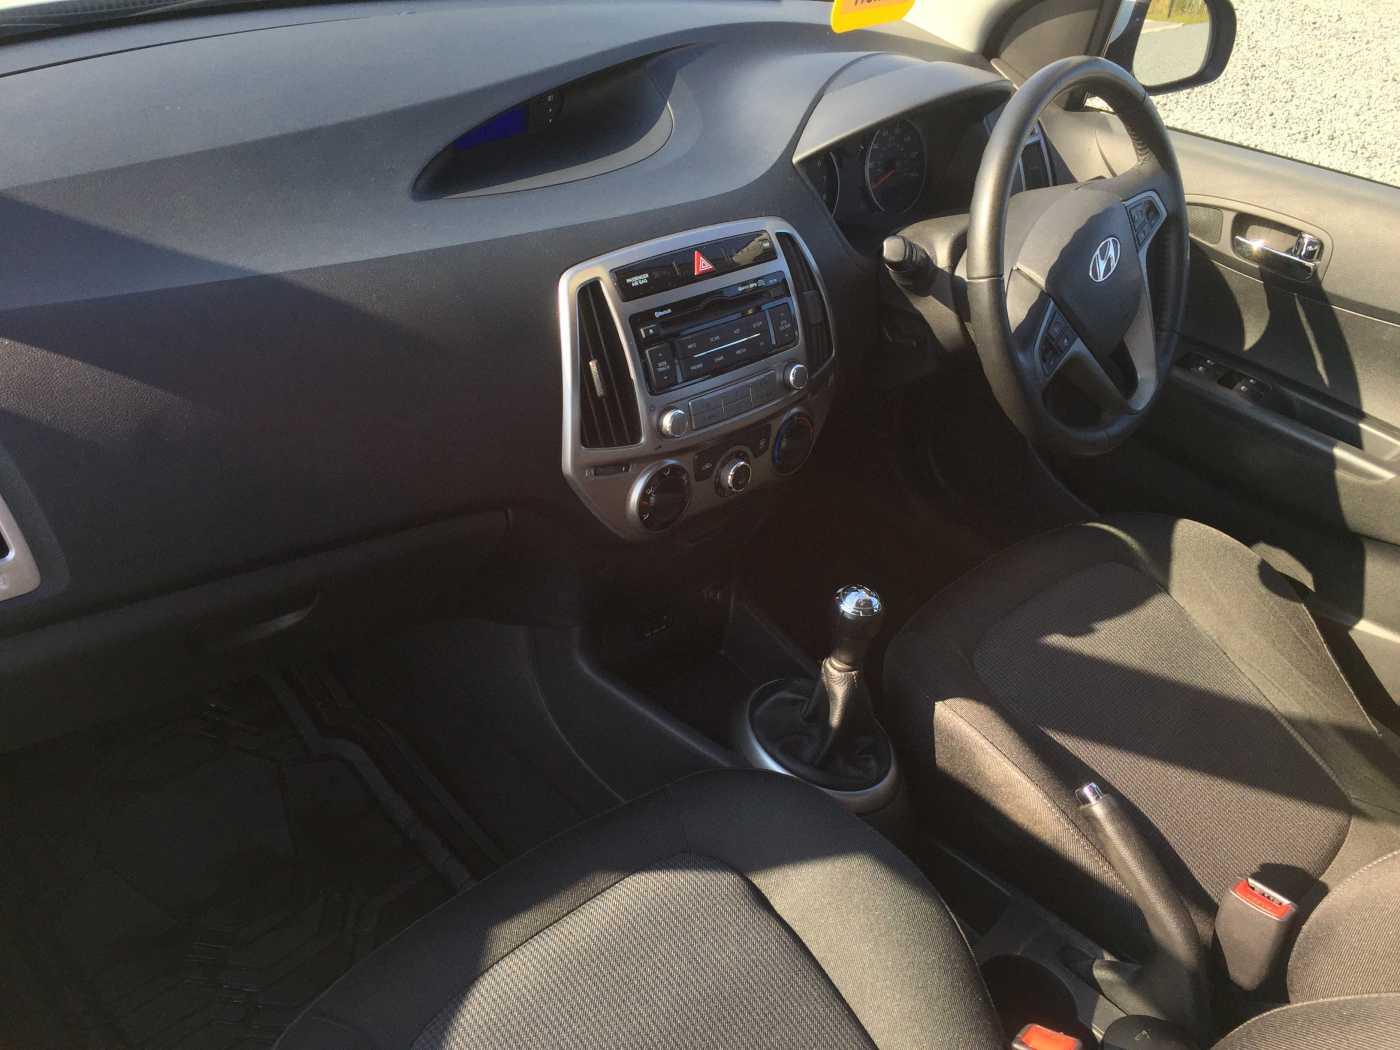 Hyundai i20 1.2 Active (85 PS) 5 Door